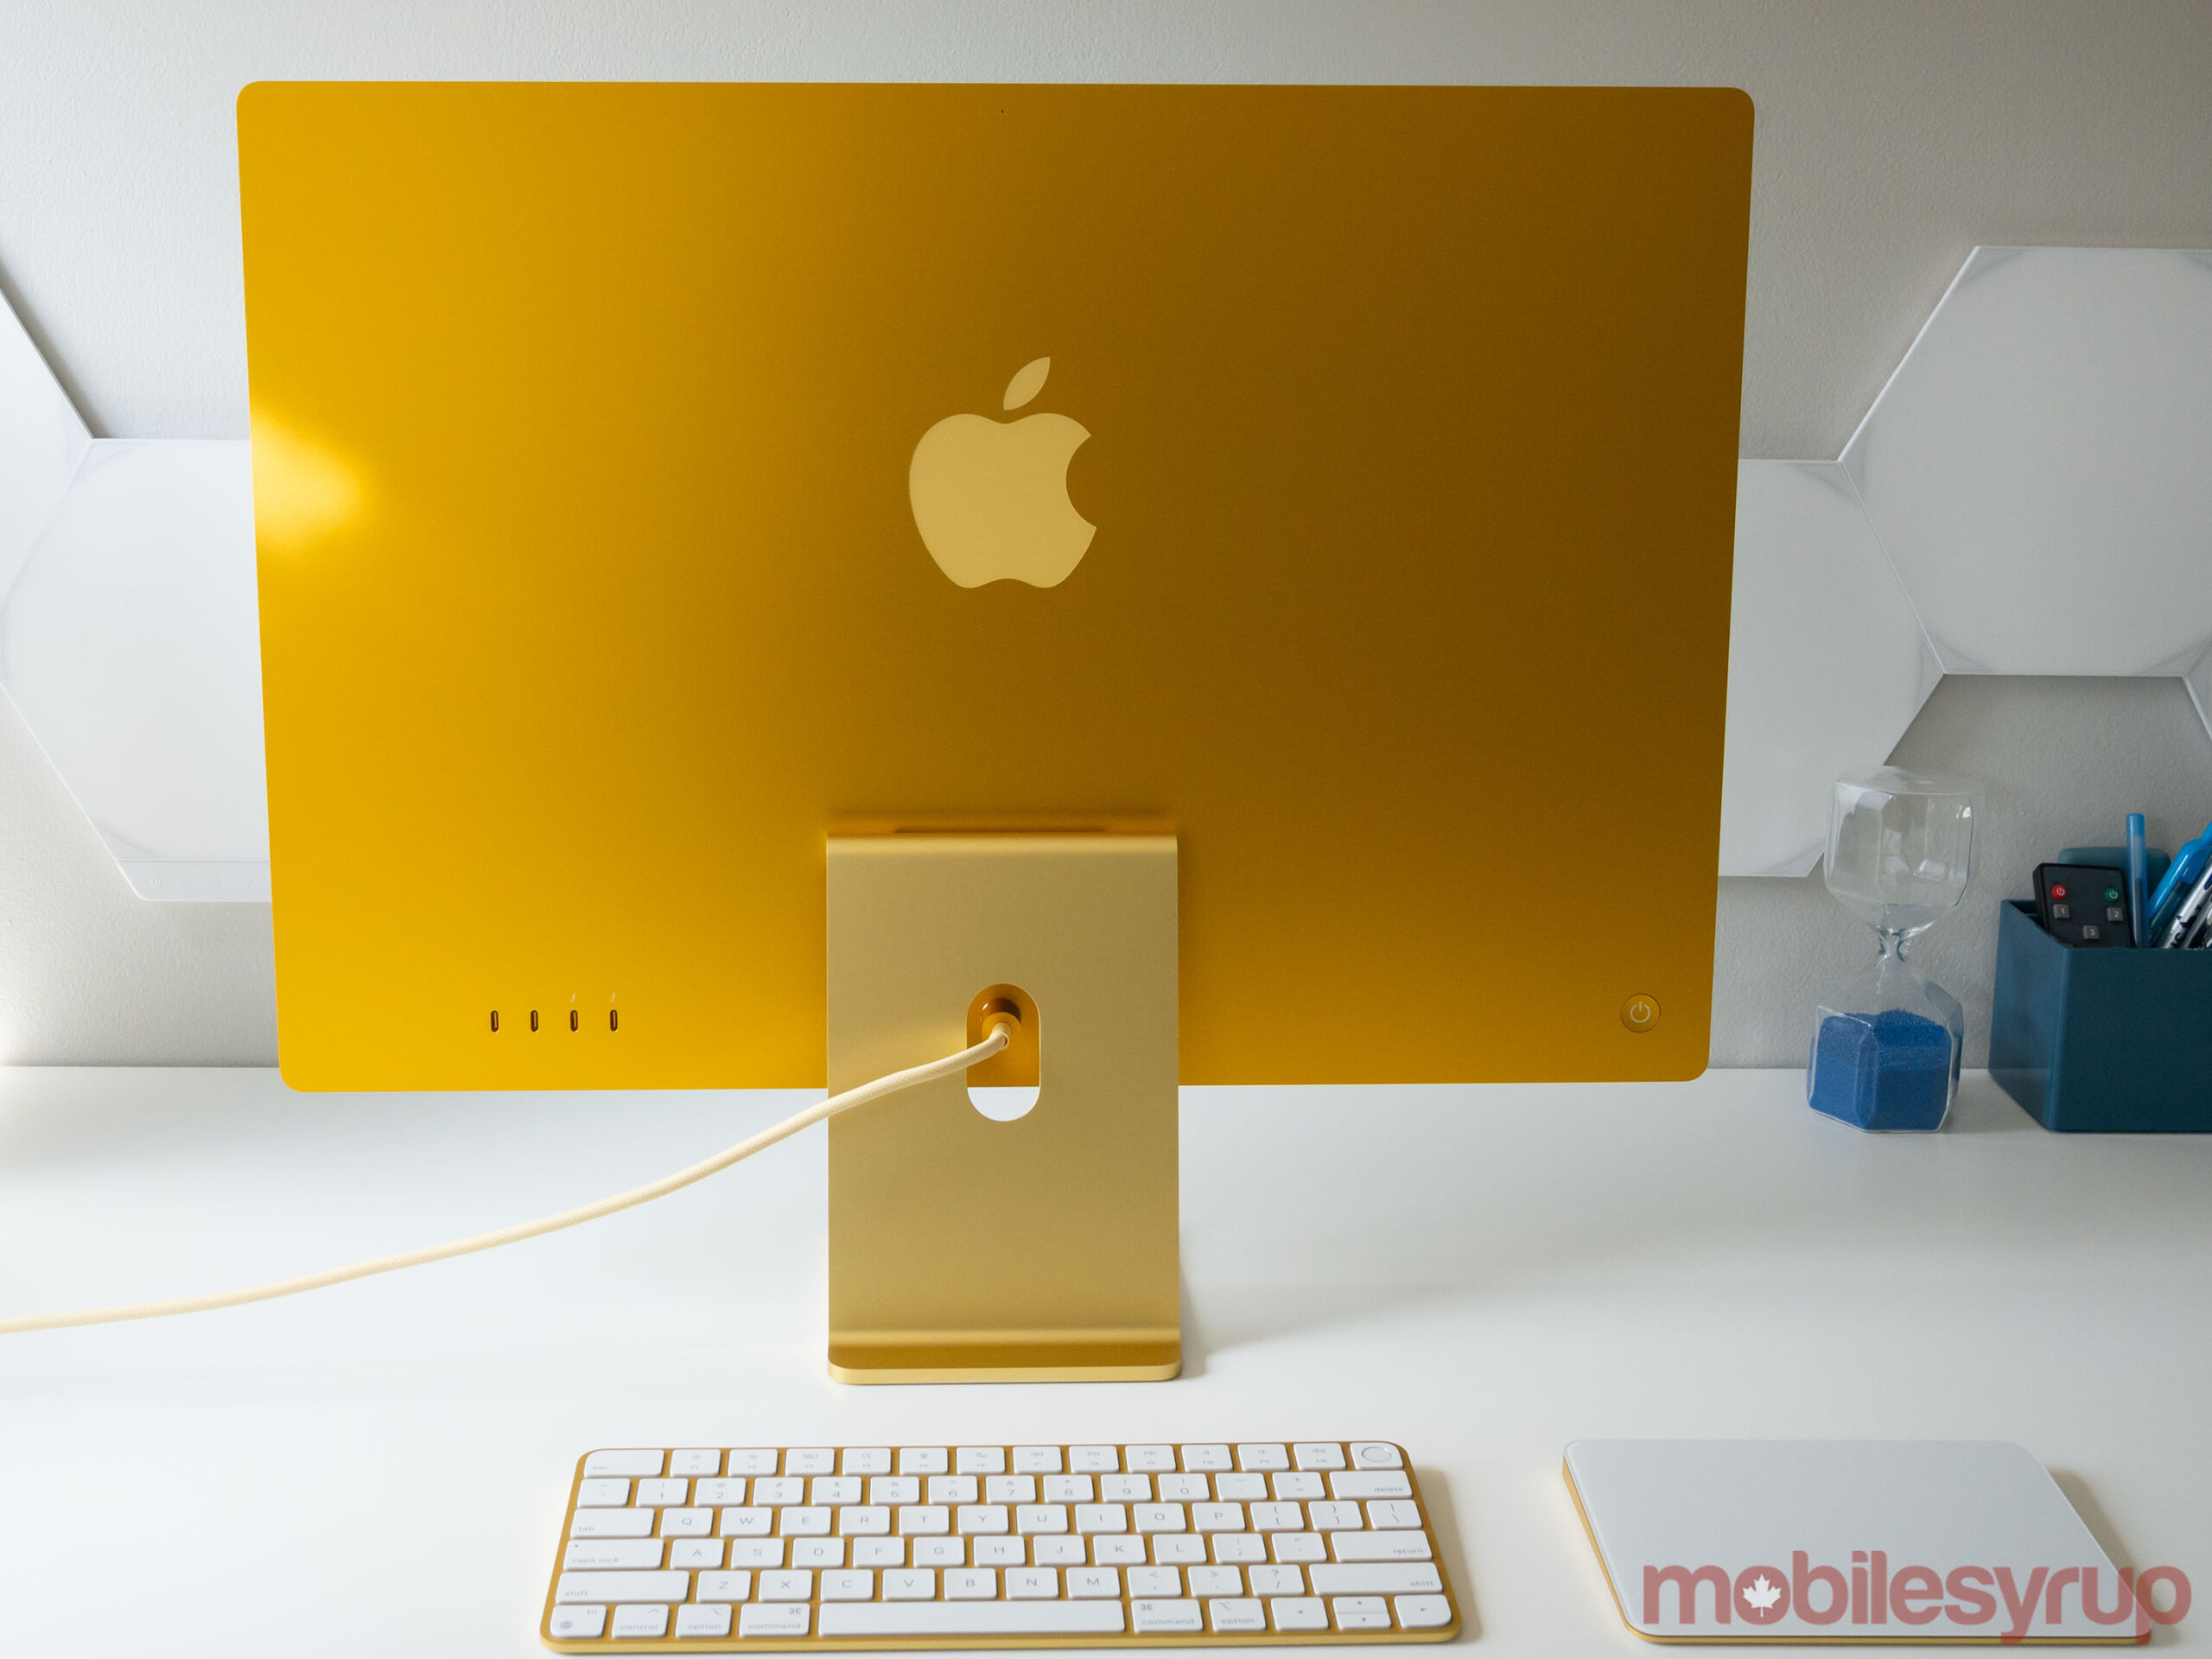 24-inch iMac 2021 back